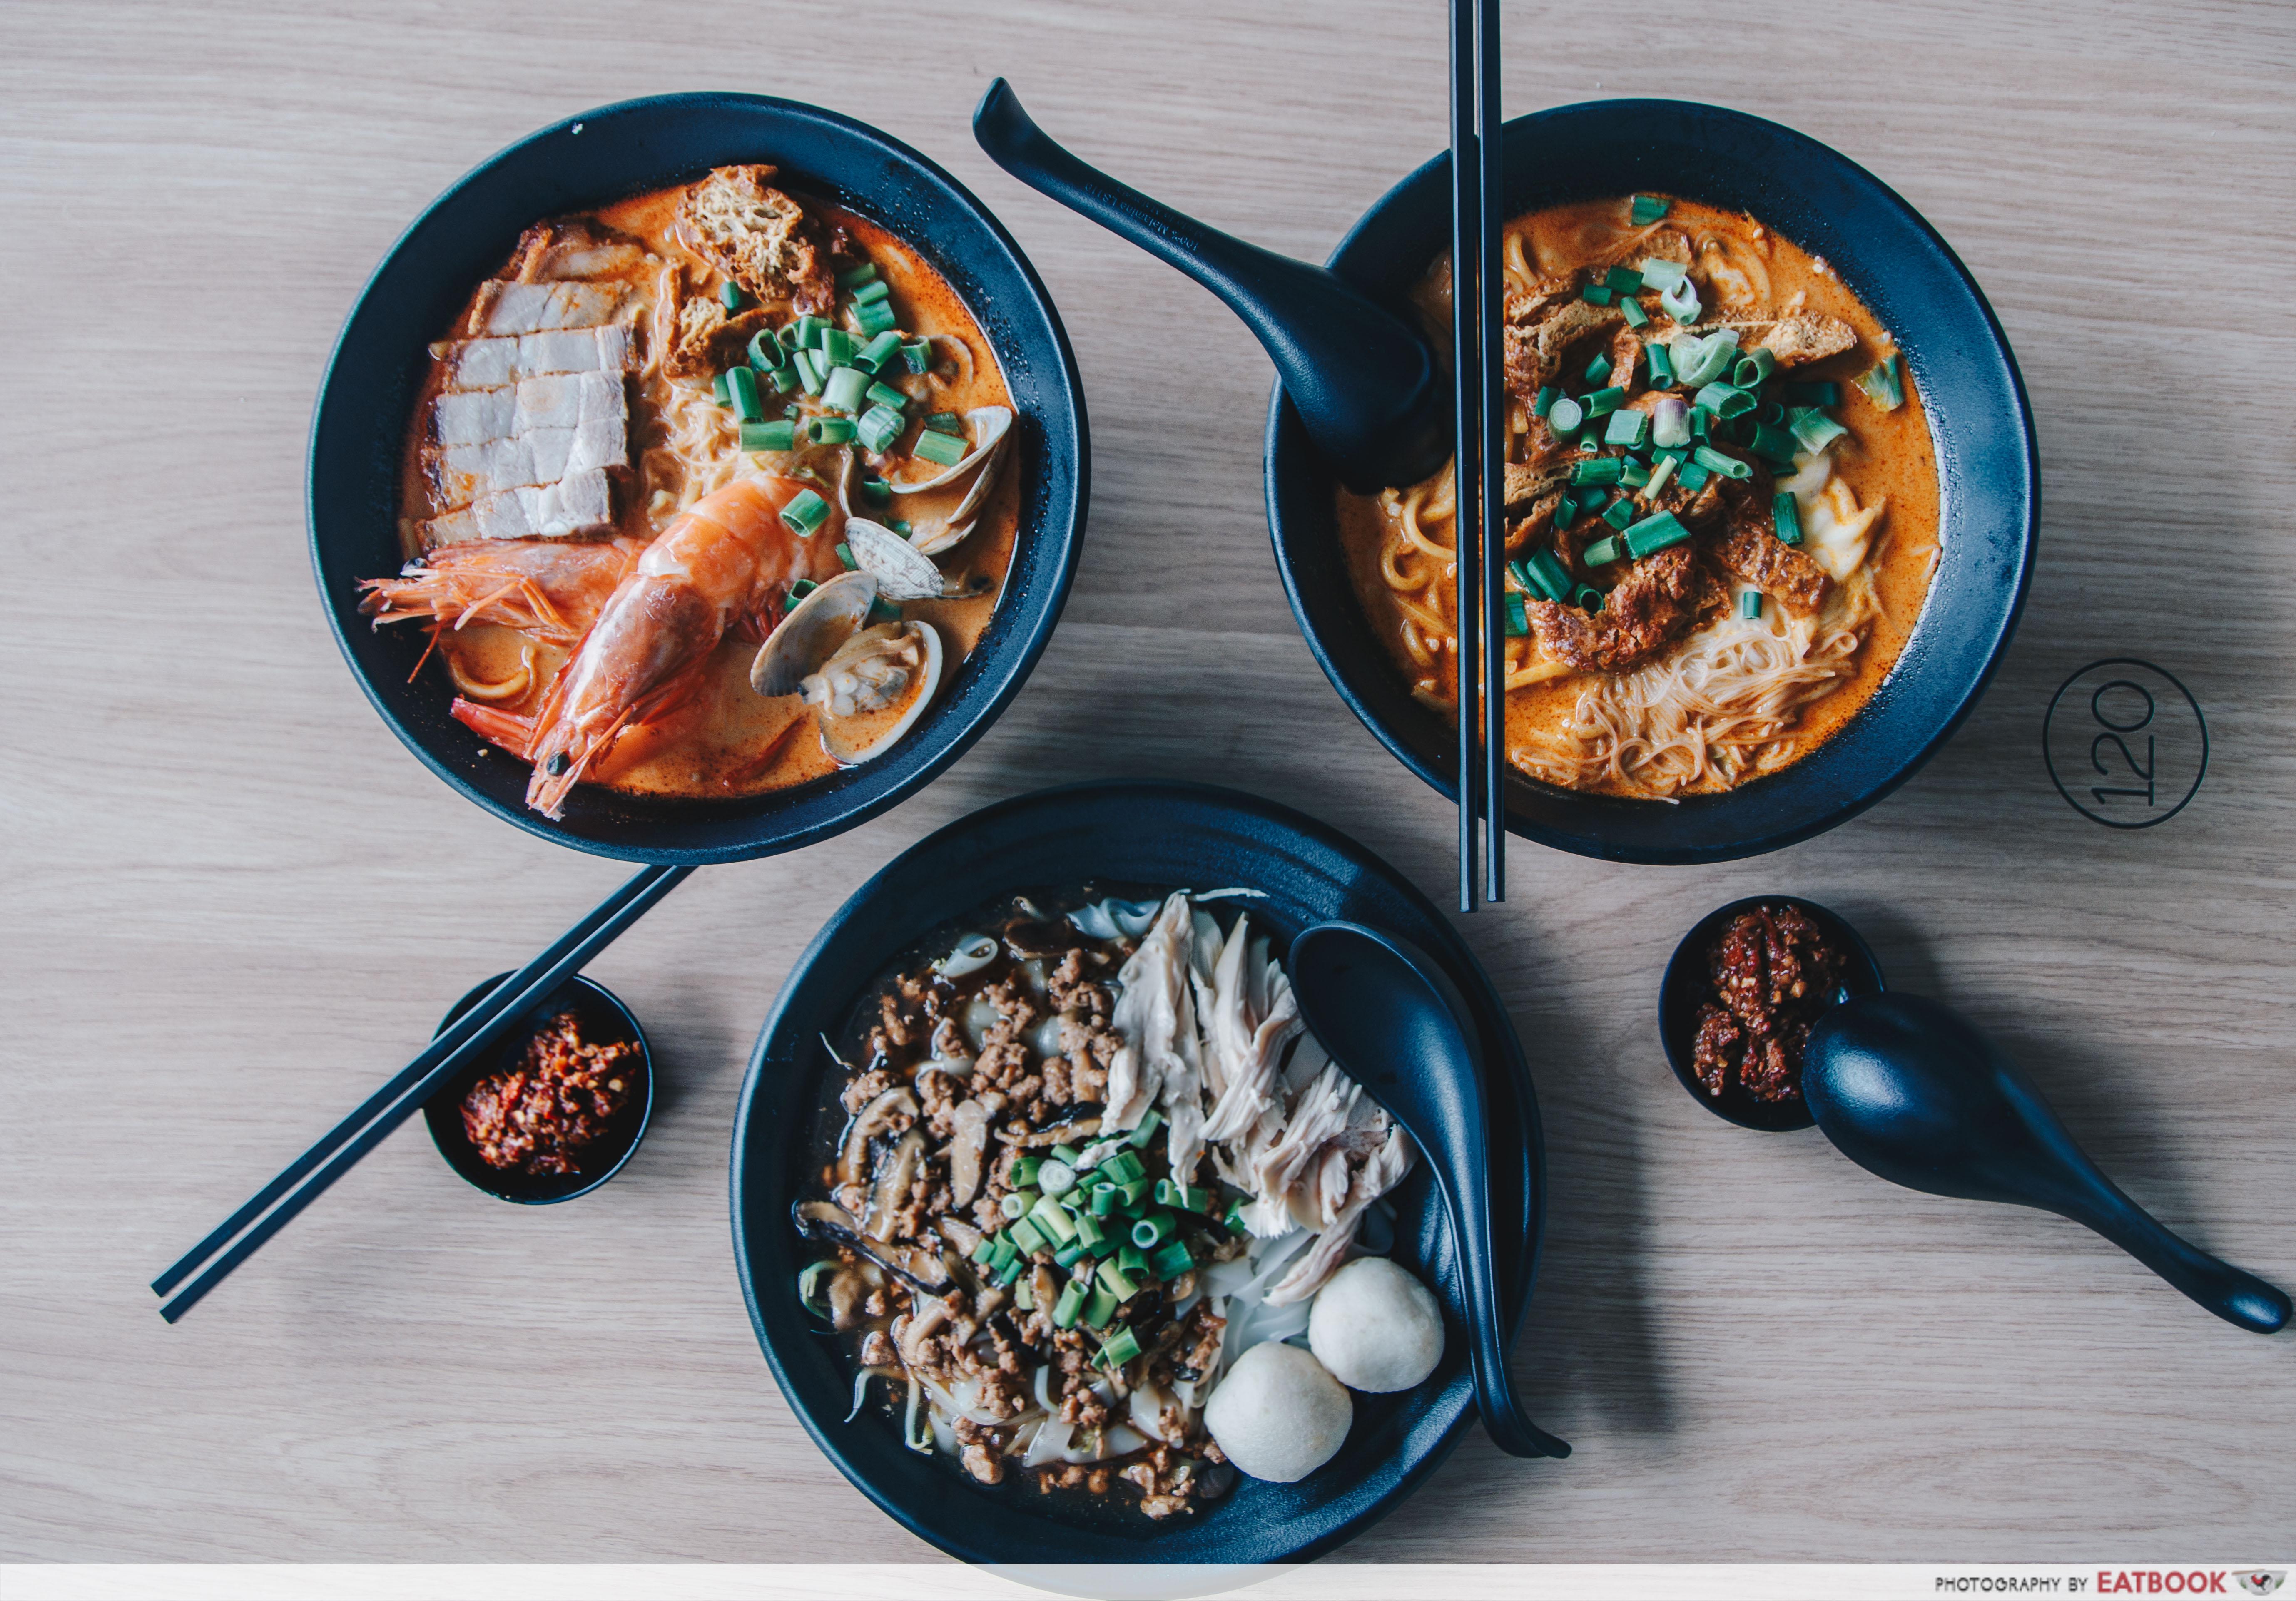 Yaps Noodles - Flatlay